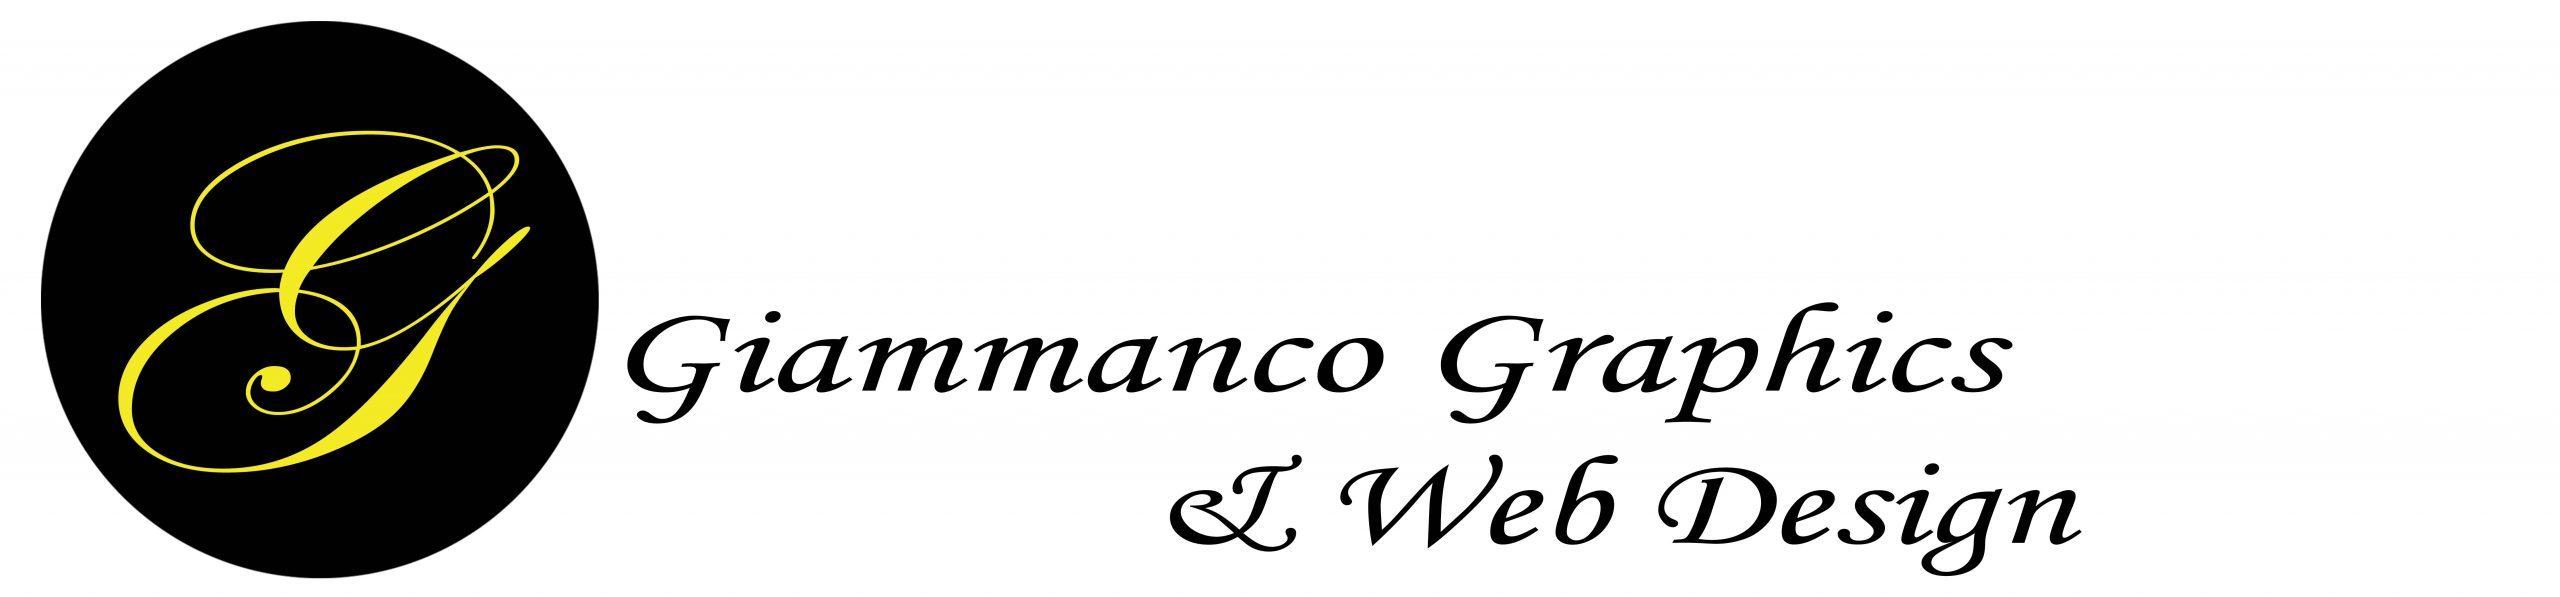 Giammanco Graphics & Web Design